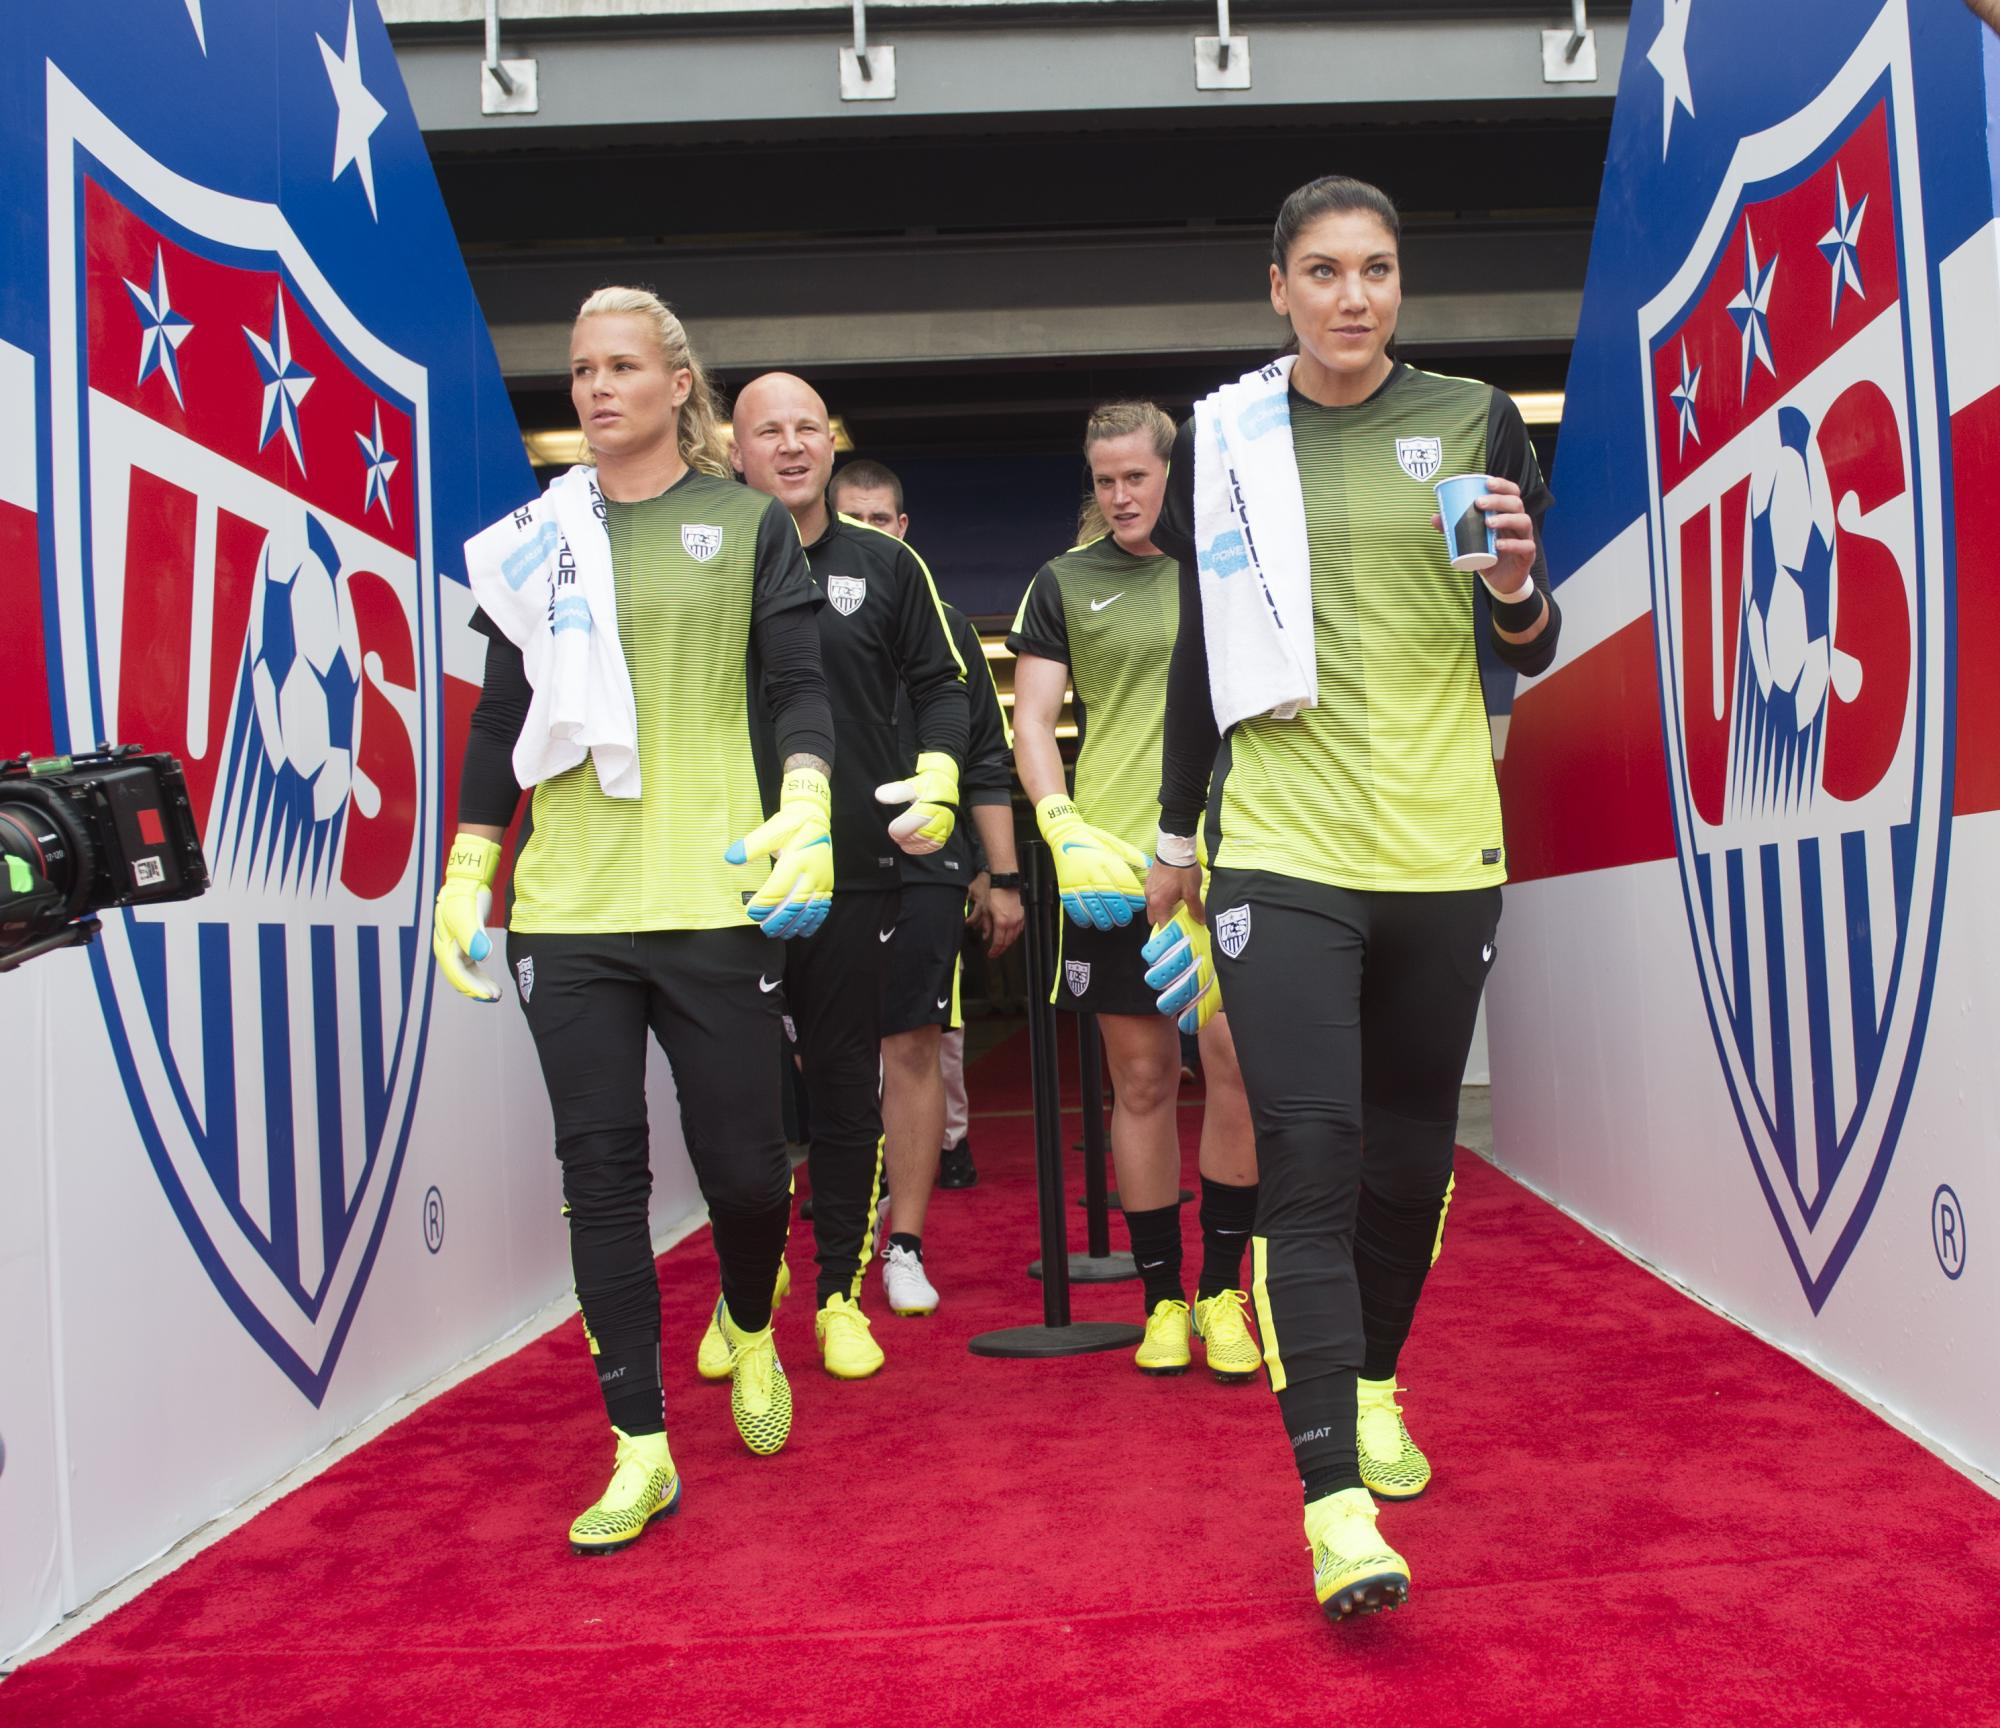 U.S. Soccer Stadium Design - Players Entrance